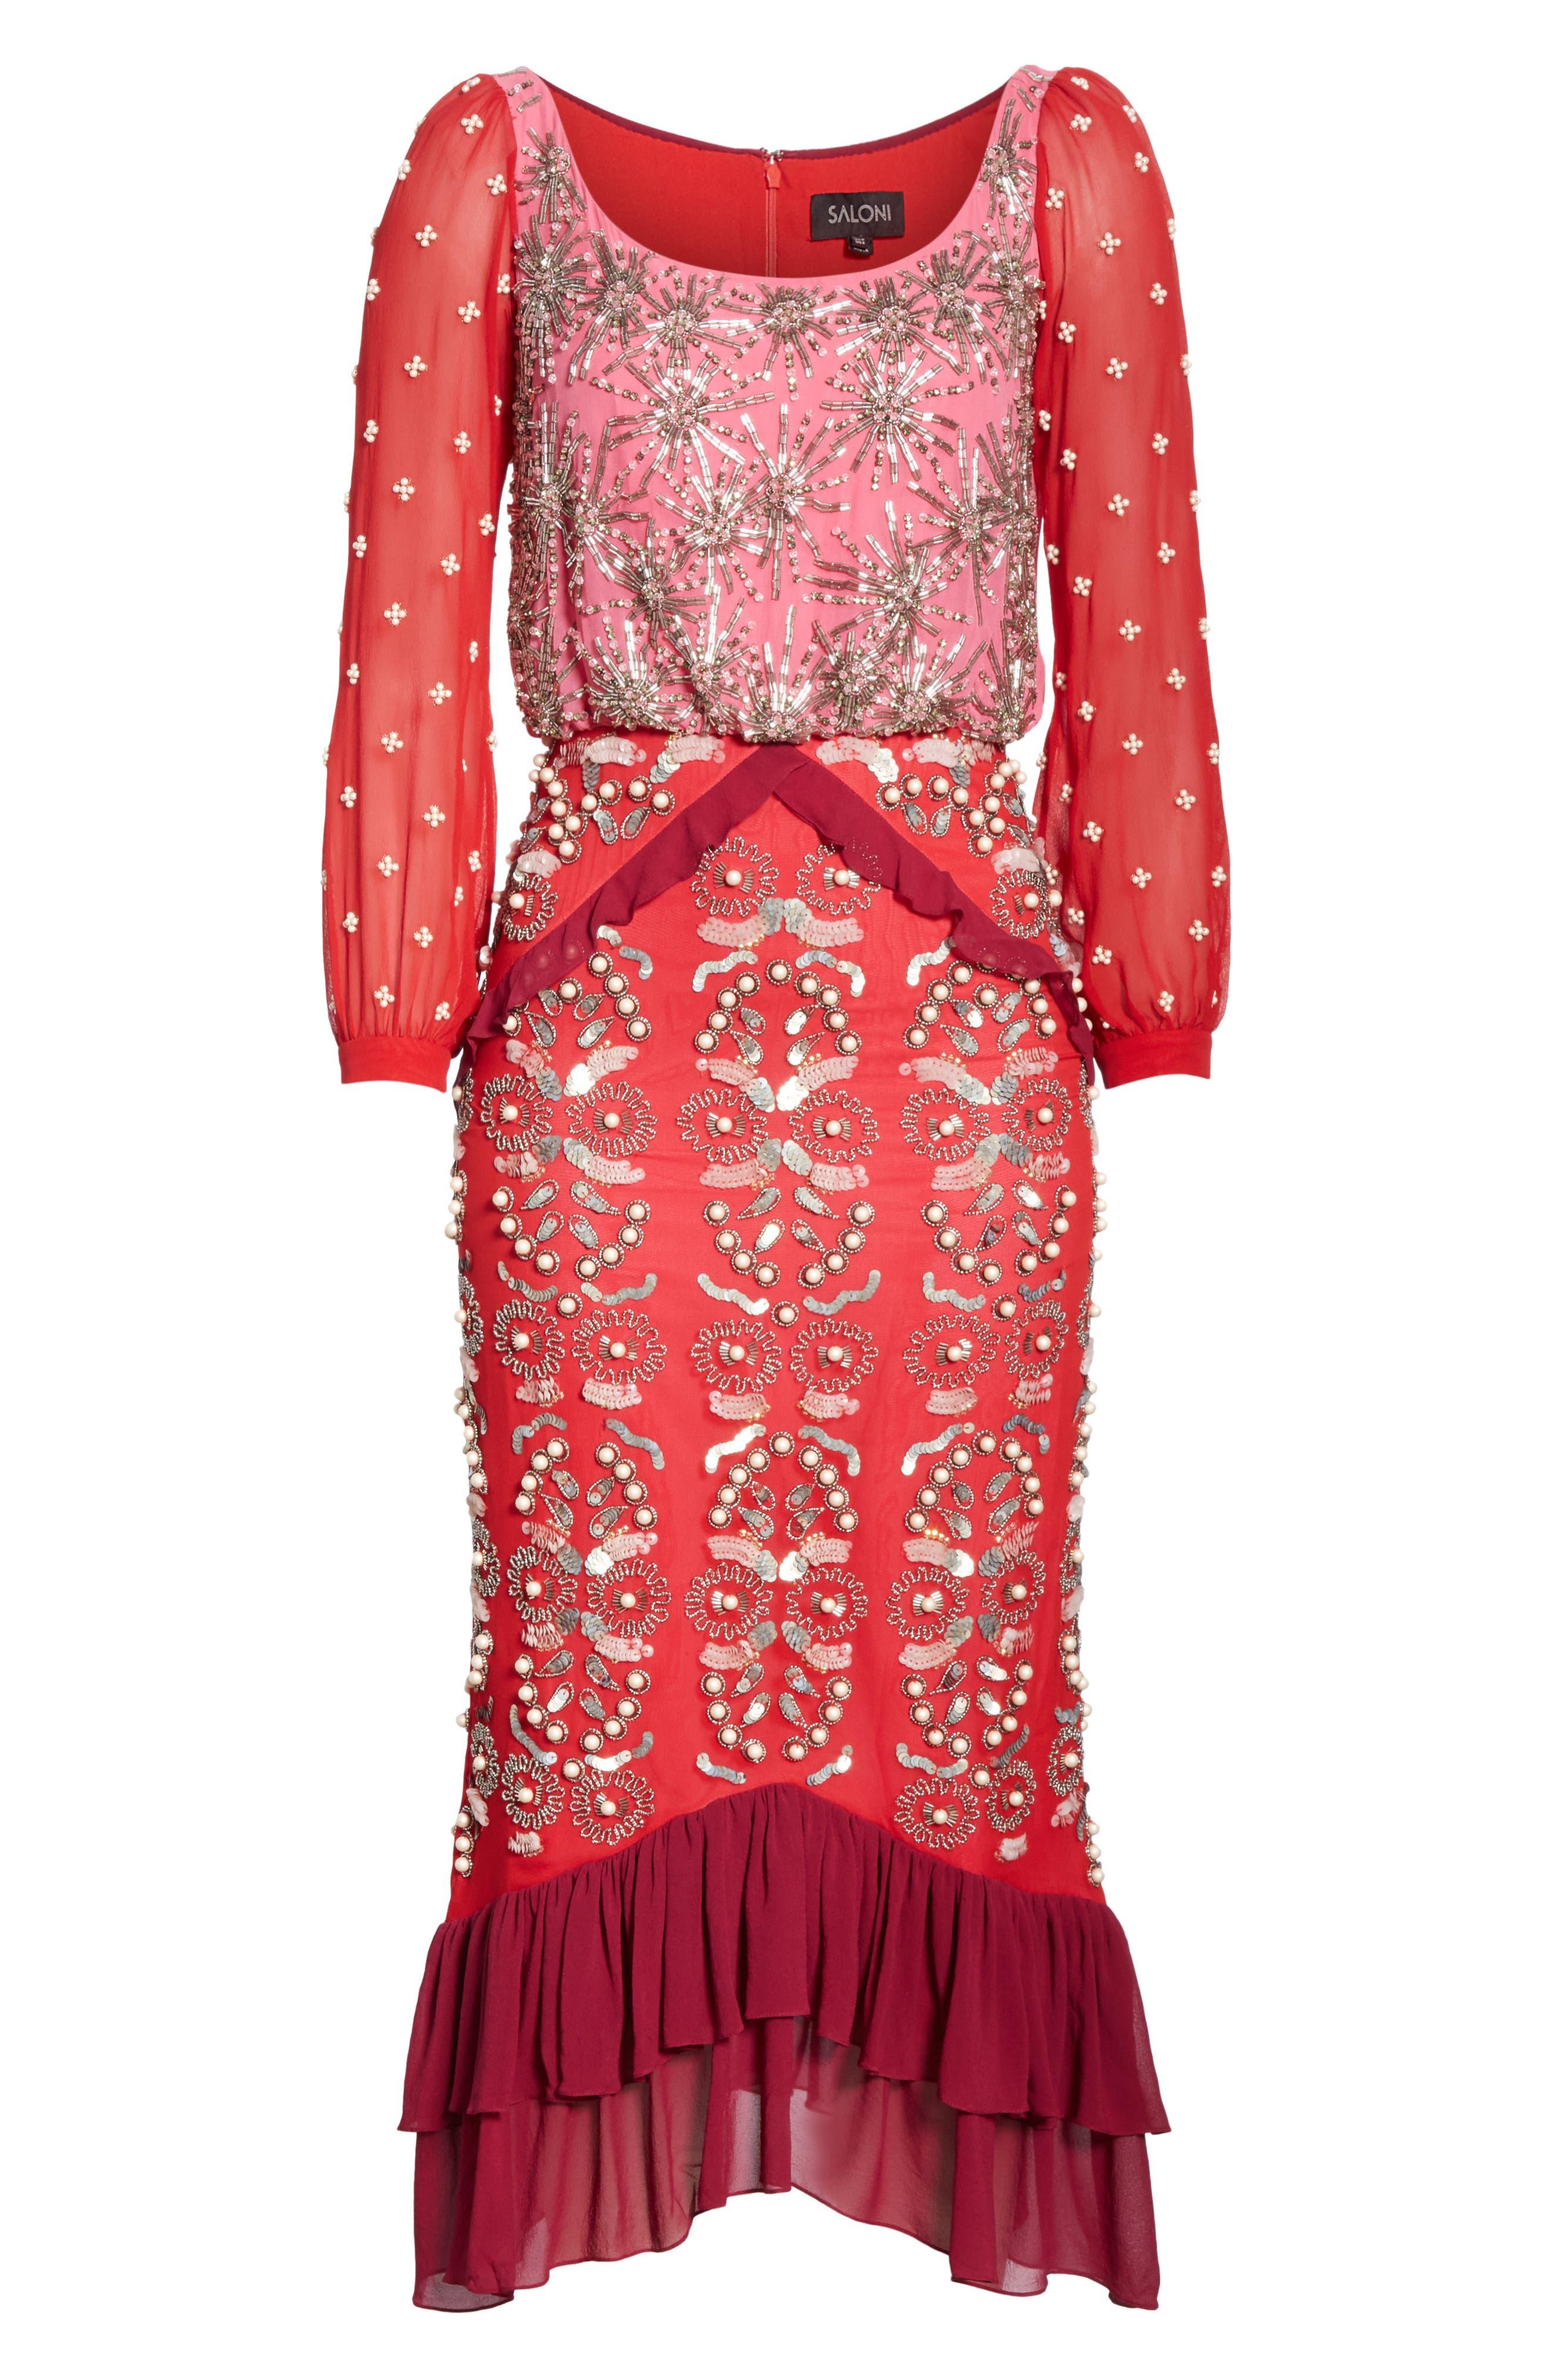 SALONI, Isa Beaded Colorblock Silk Midi Dress, Alternate thumbnail 6, color, PINK/ CHERRY